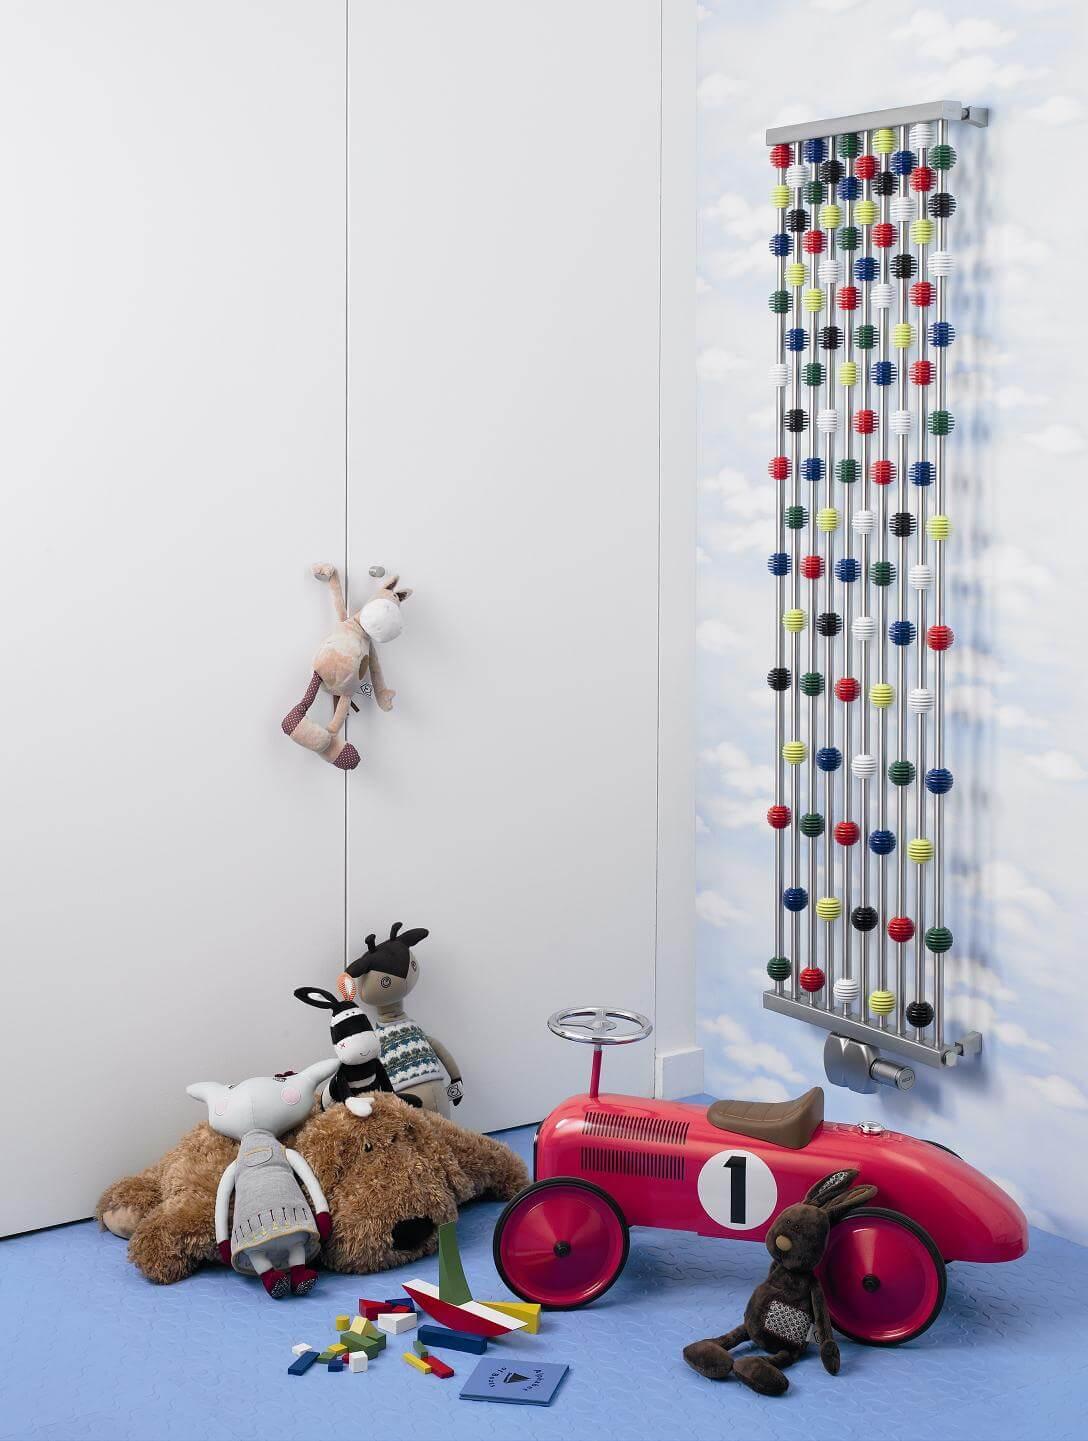 Abacus radiator